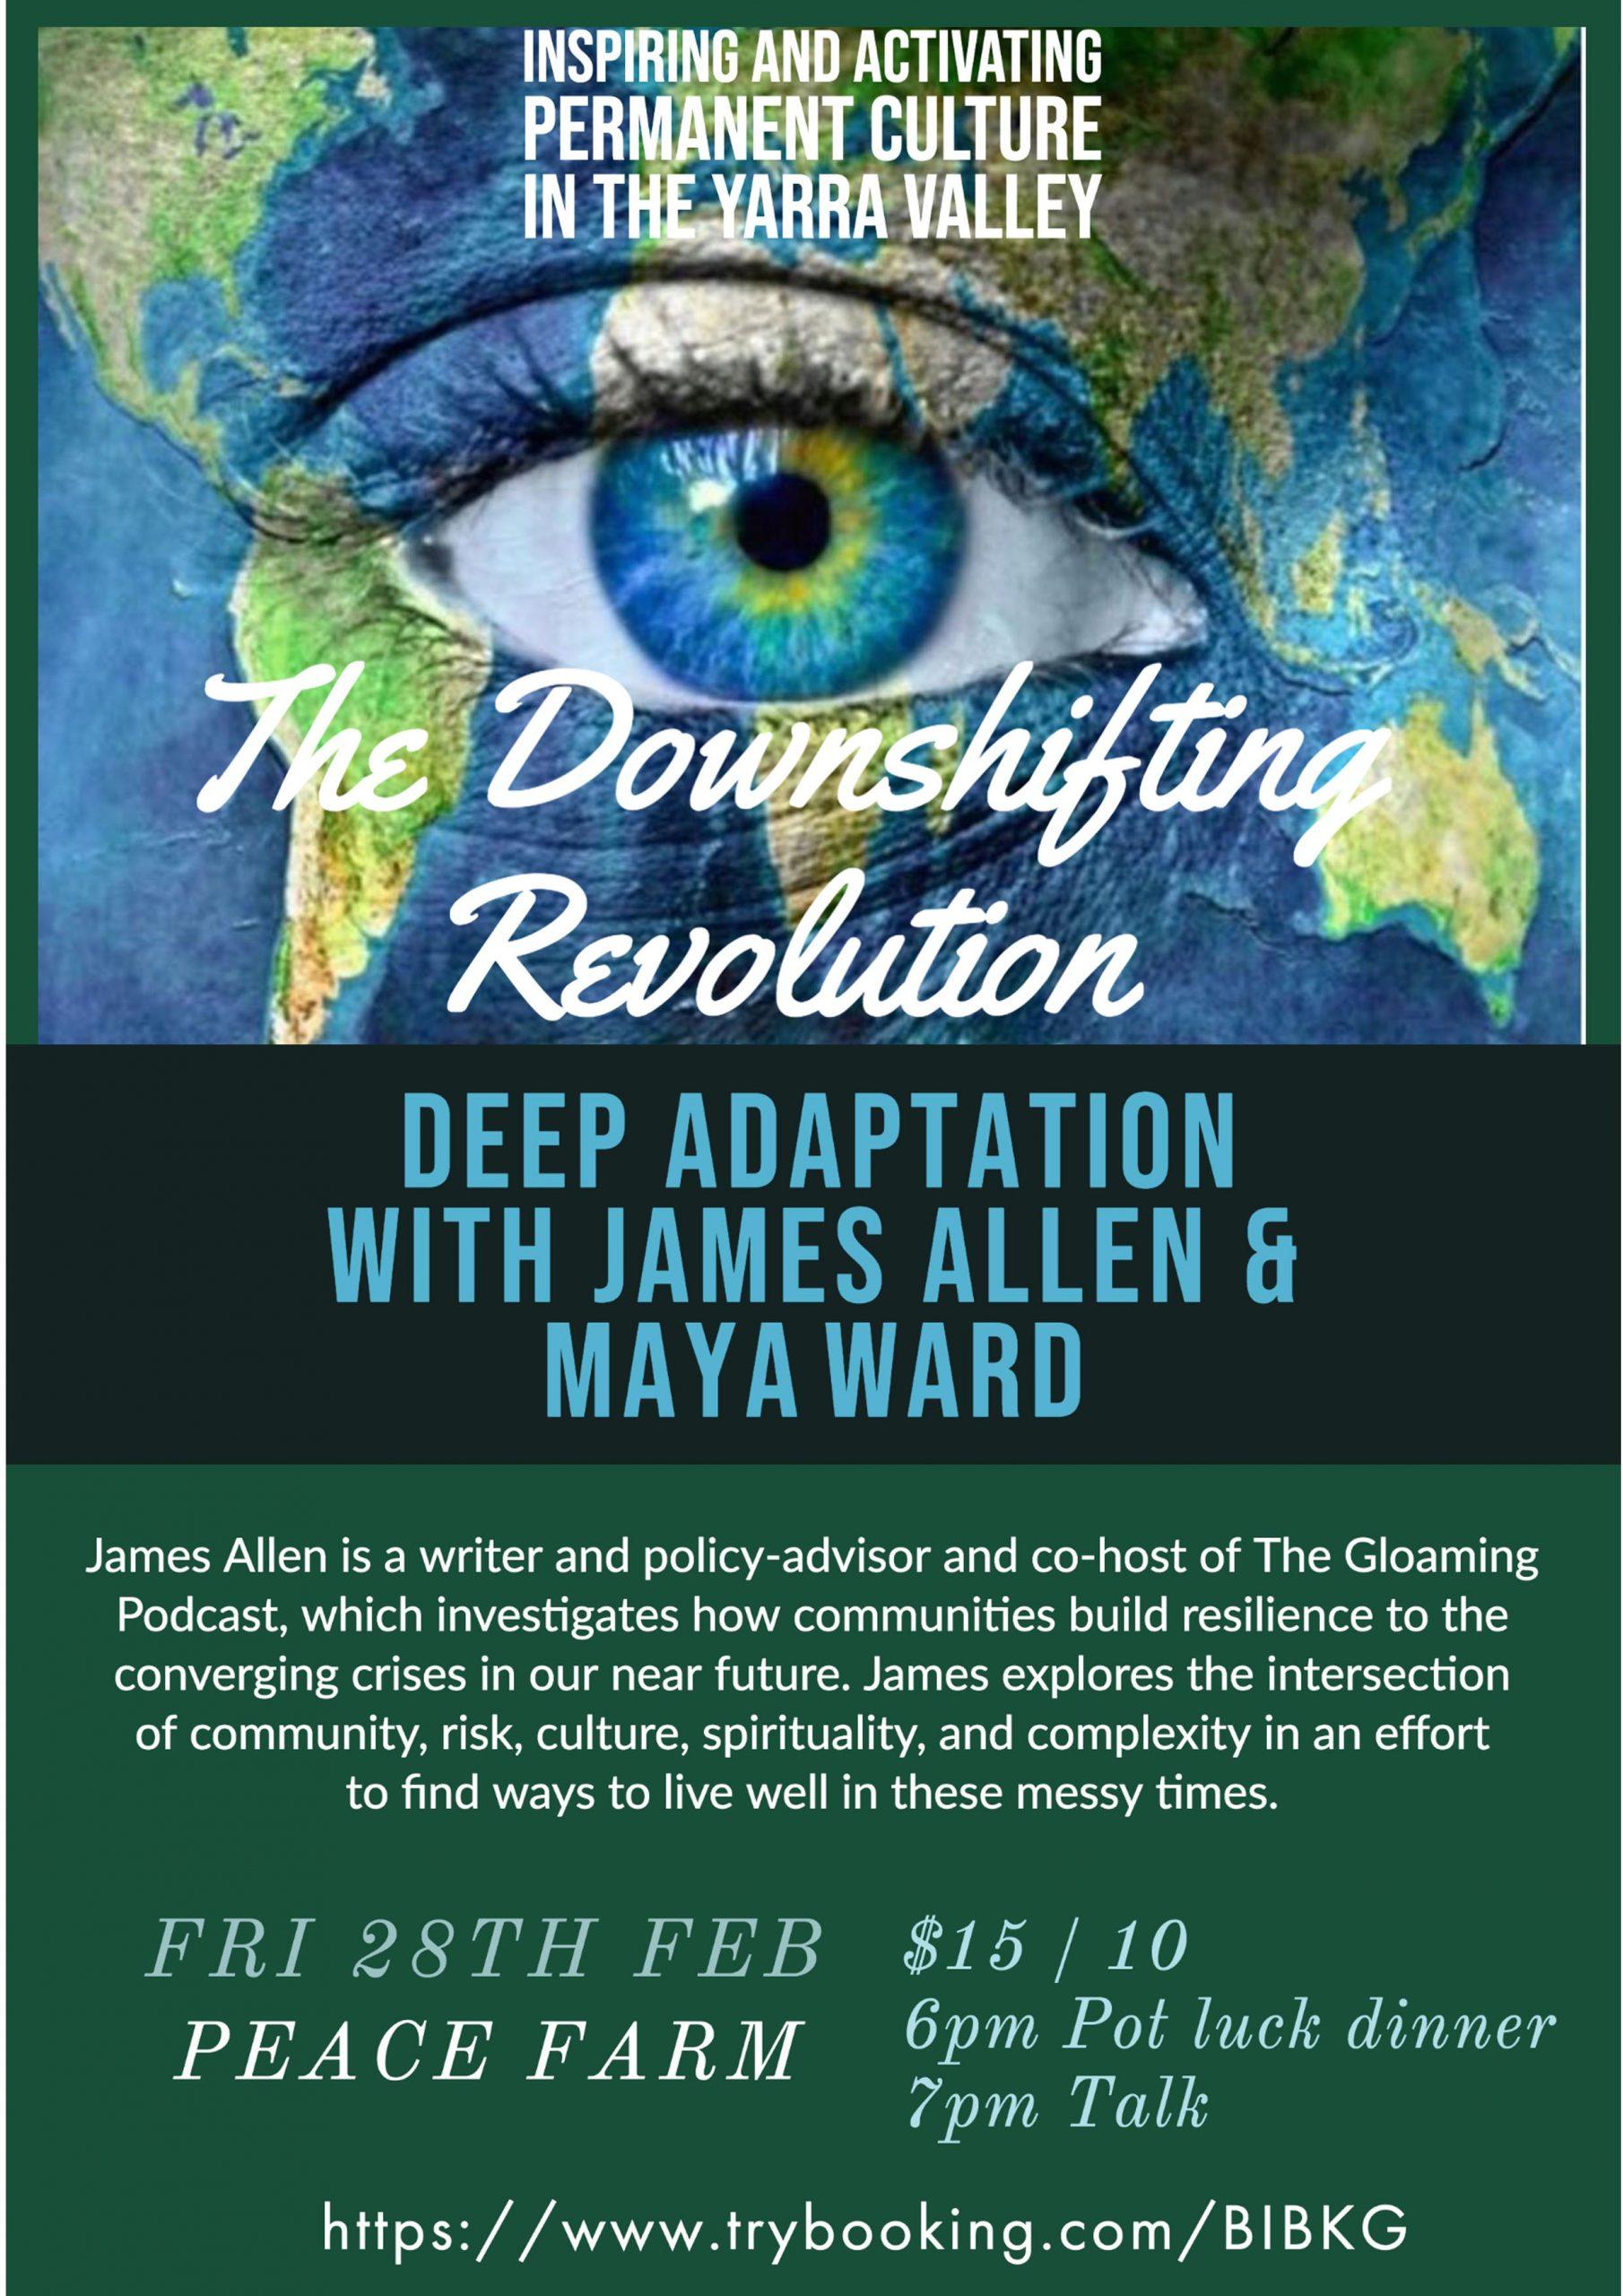 downshifting revolution poster